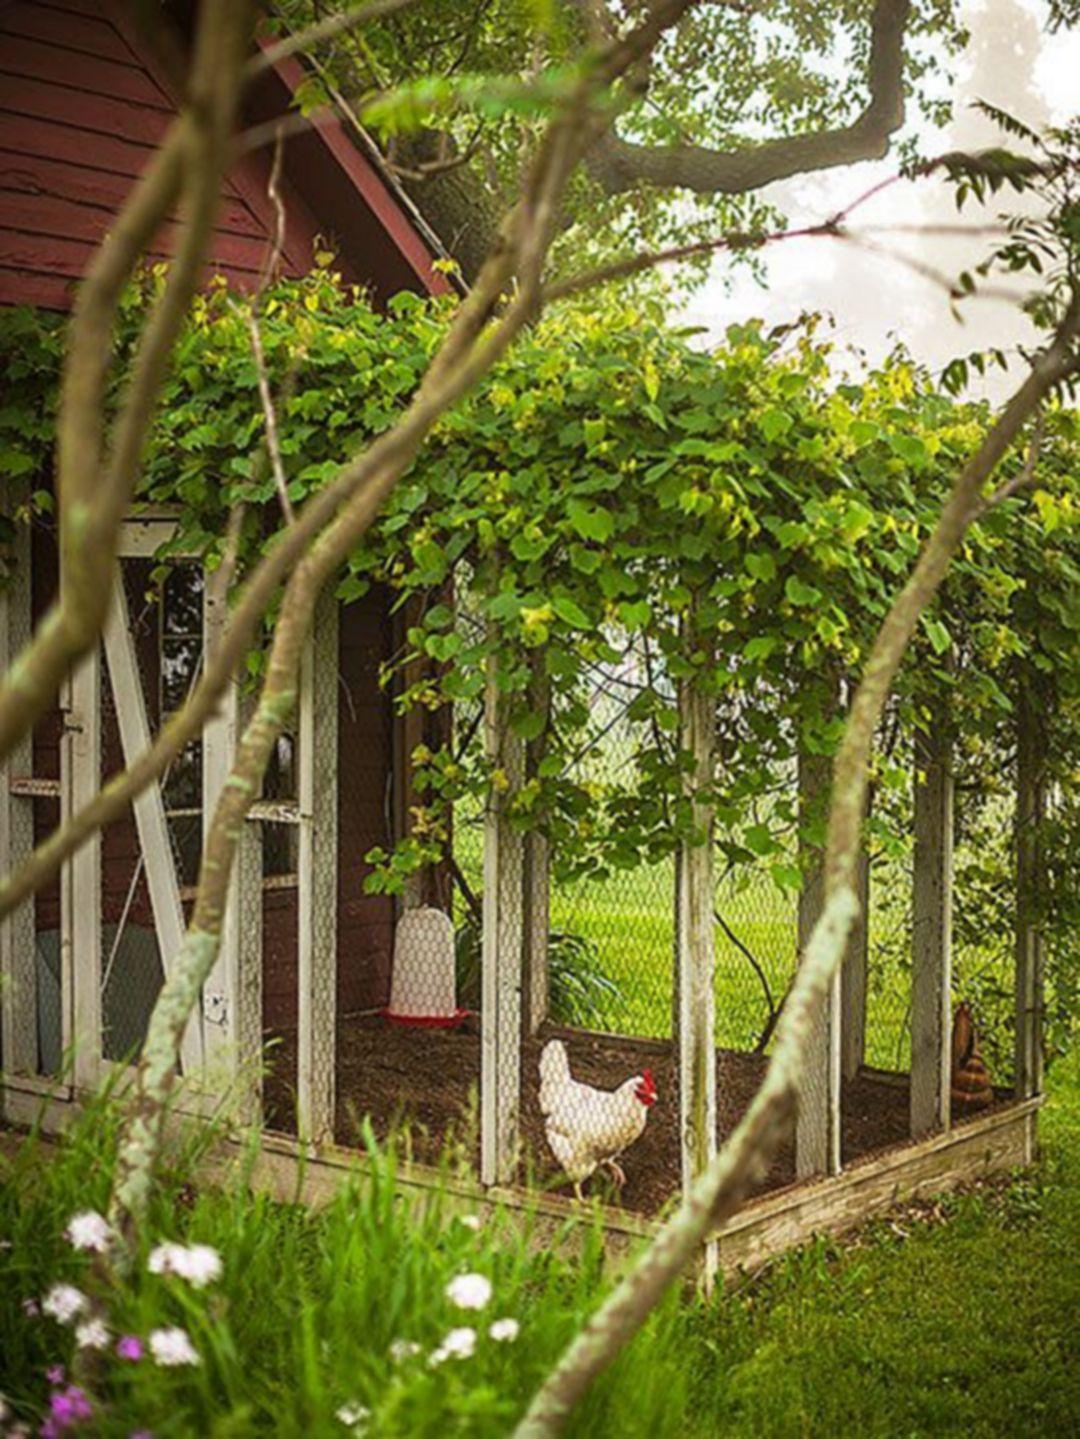 The Best 20 Most Effective and Easy Chicken Run Garden Inspiration https://hroomy.com/plants-garden/20-most-effective-and-easy-chicken-run-garden-inspiration/